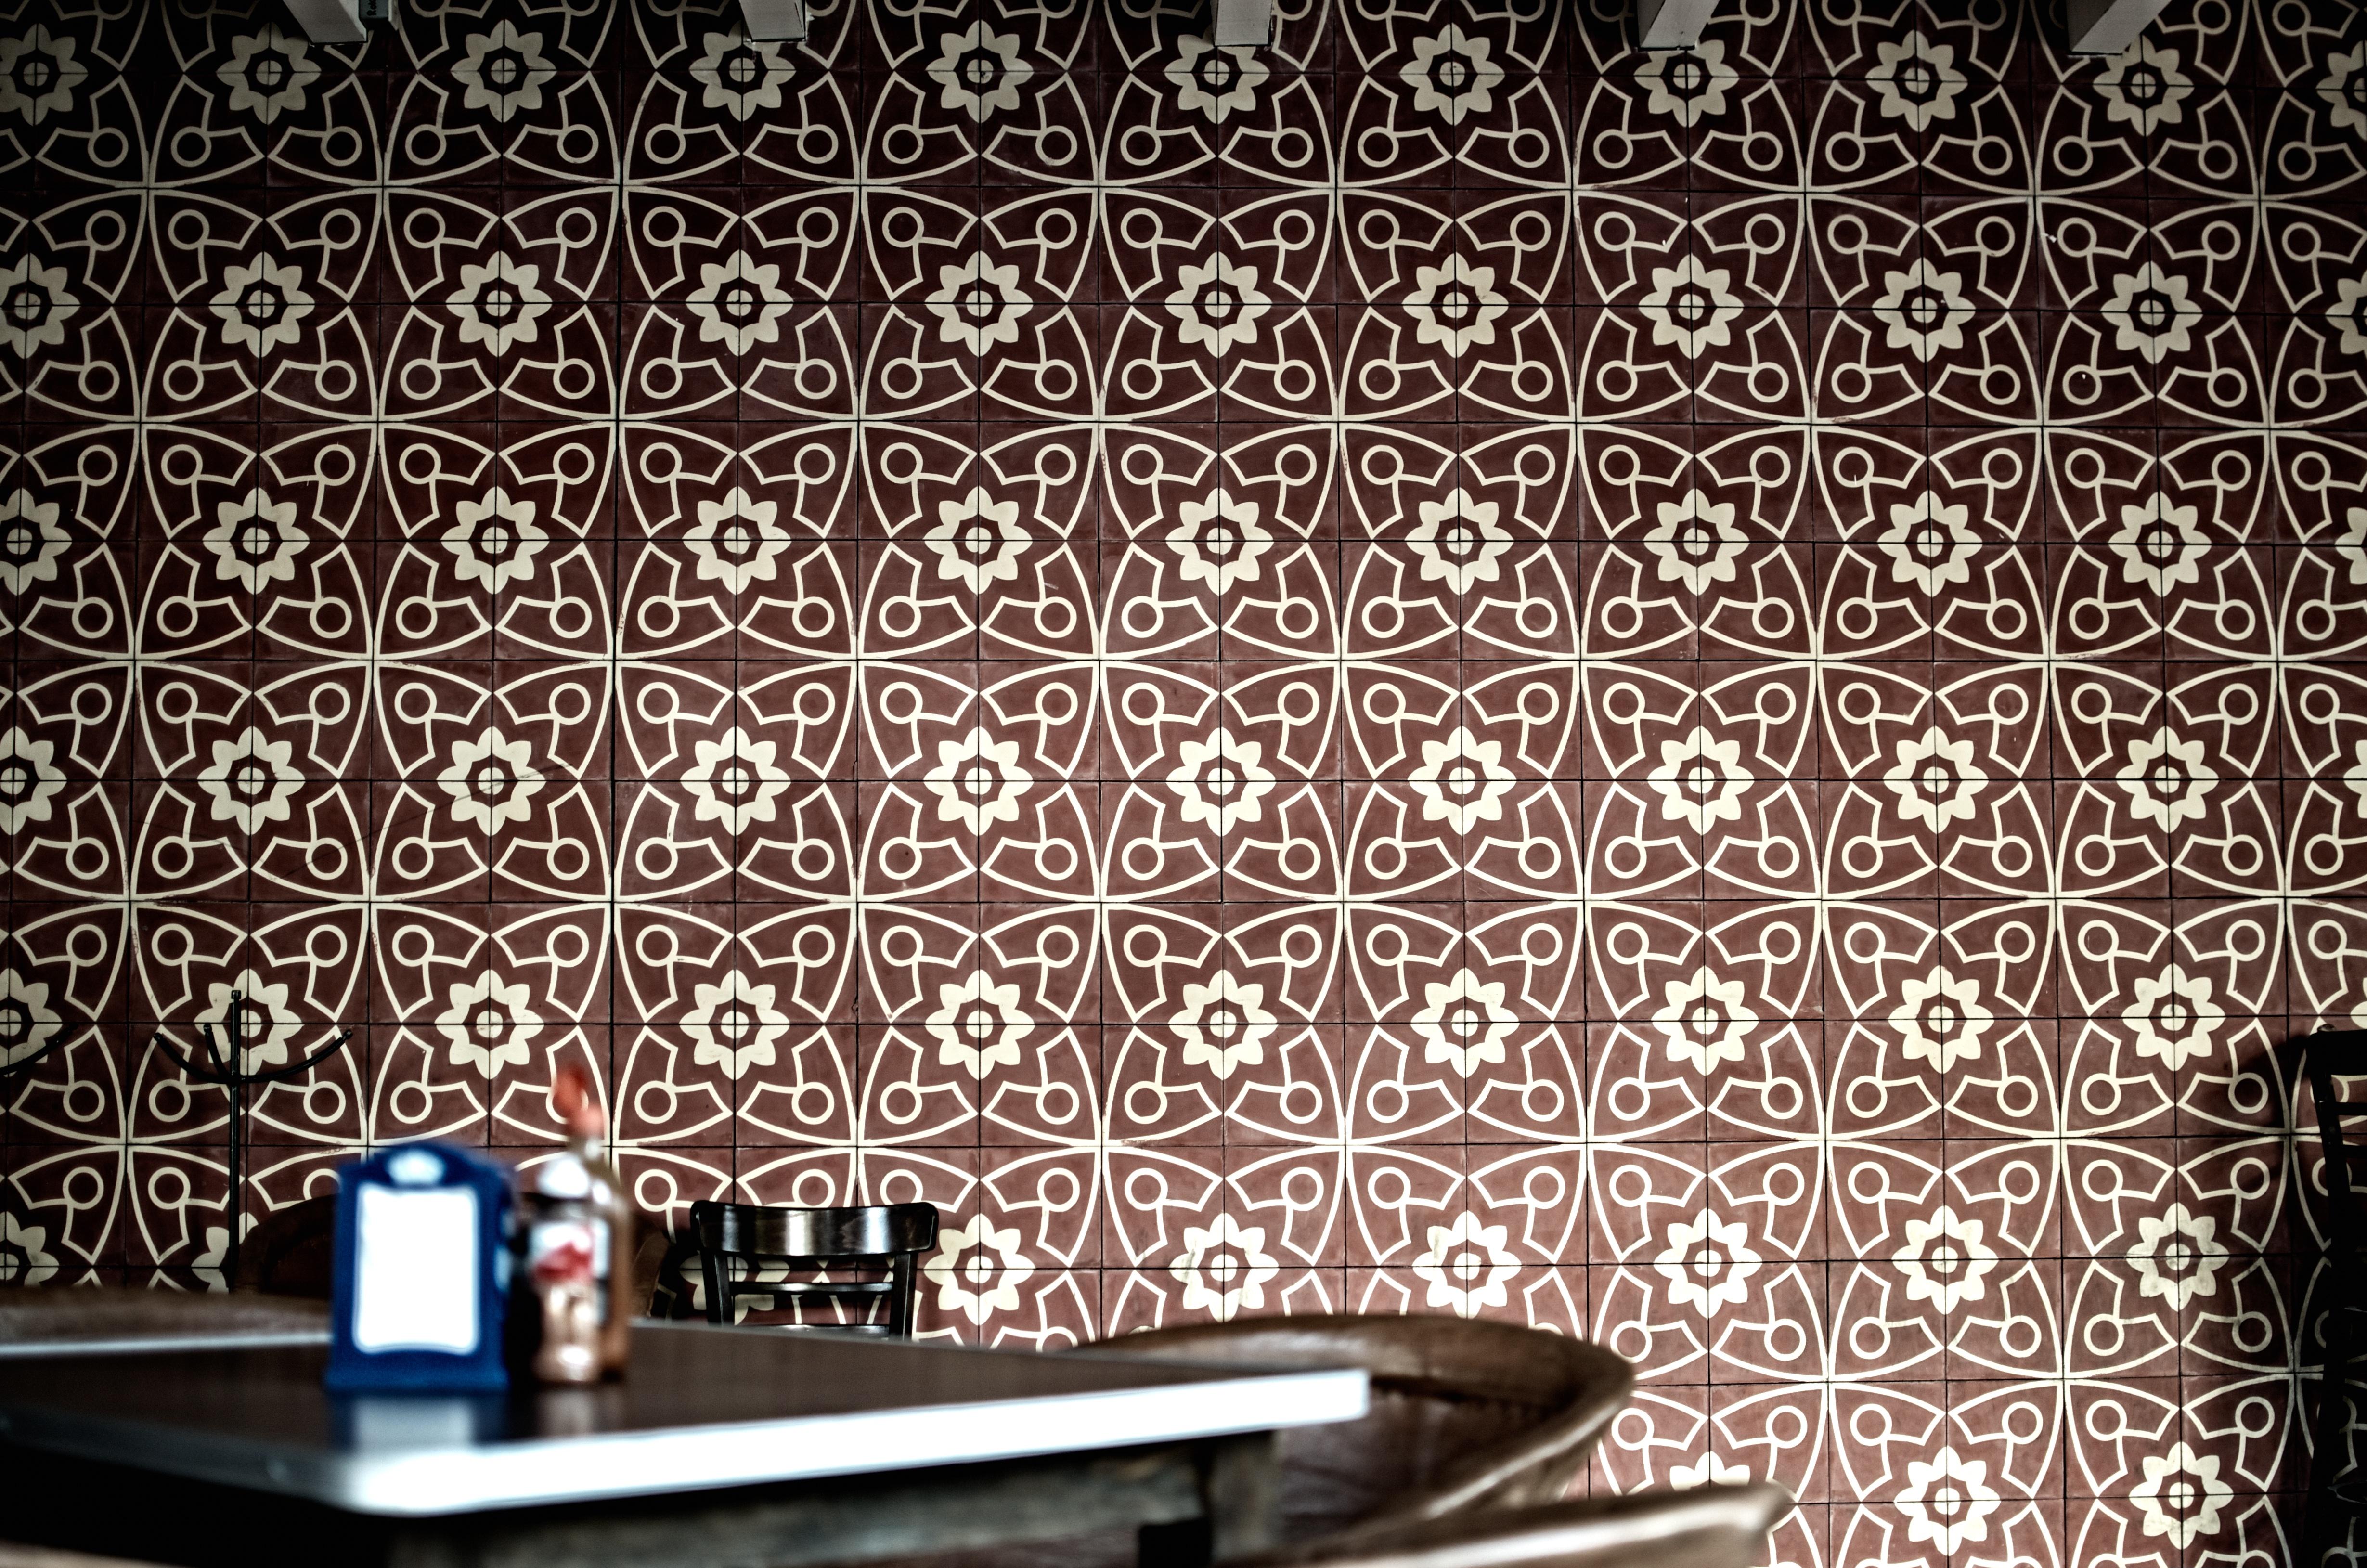 Gambar Kafe Pedalaman Pola Coklat Ubin Desain Interior Fon